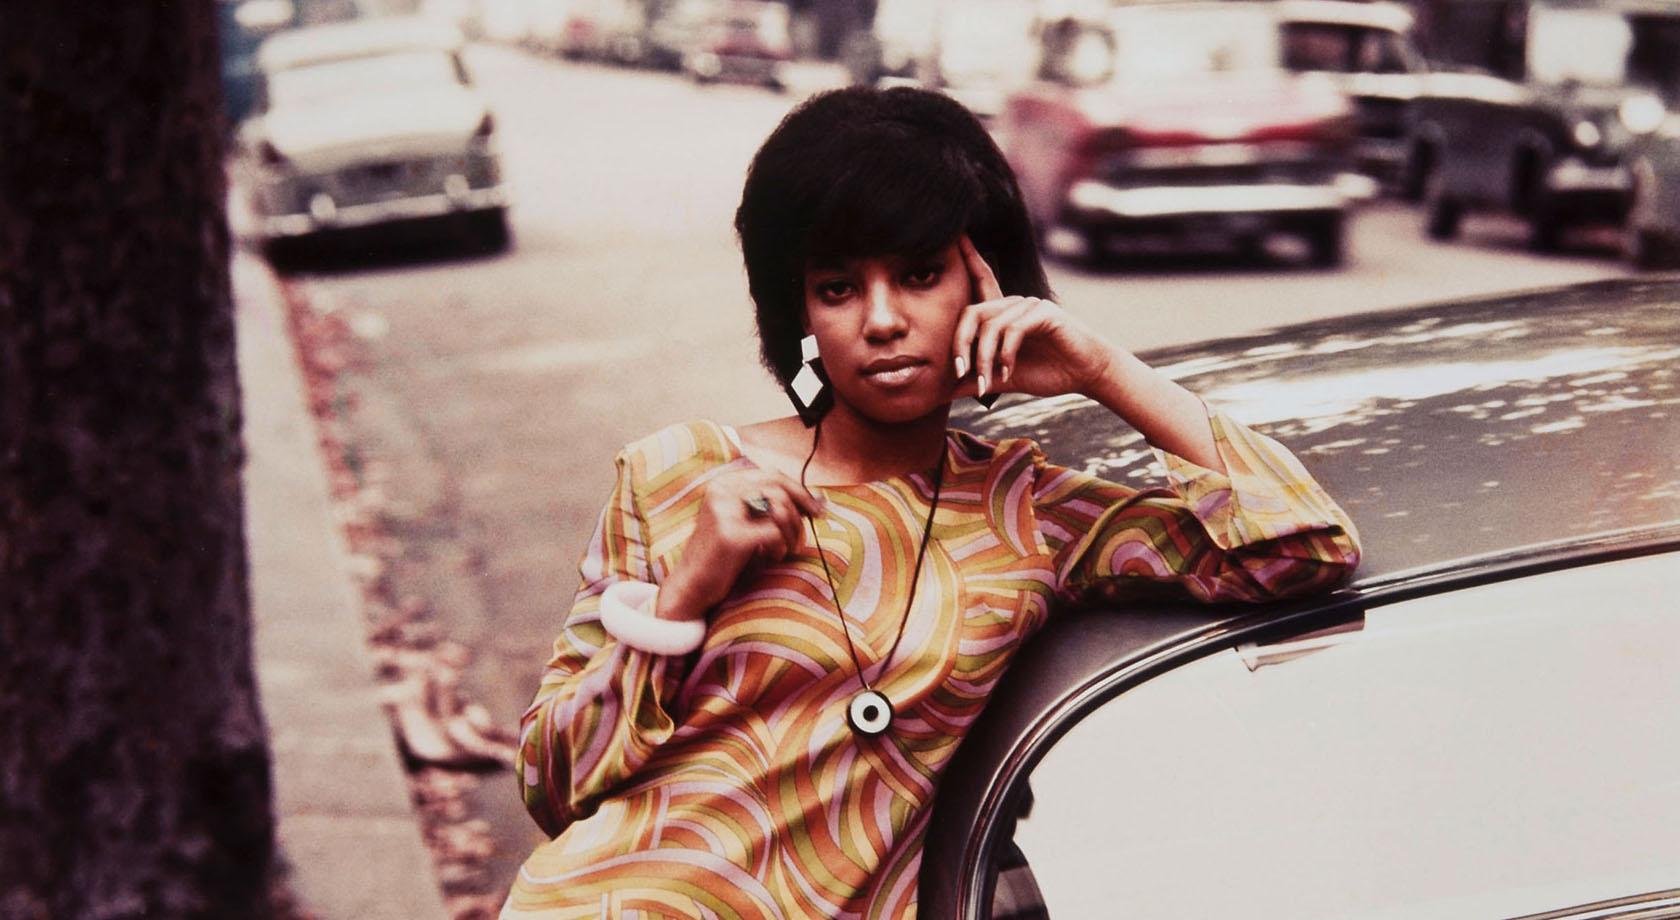 Drum-Cover-Girl-Erlin-Ibreck-detail-James-Barnor-1966-TM-6510-7